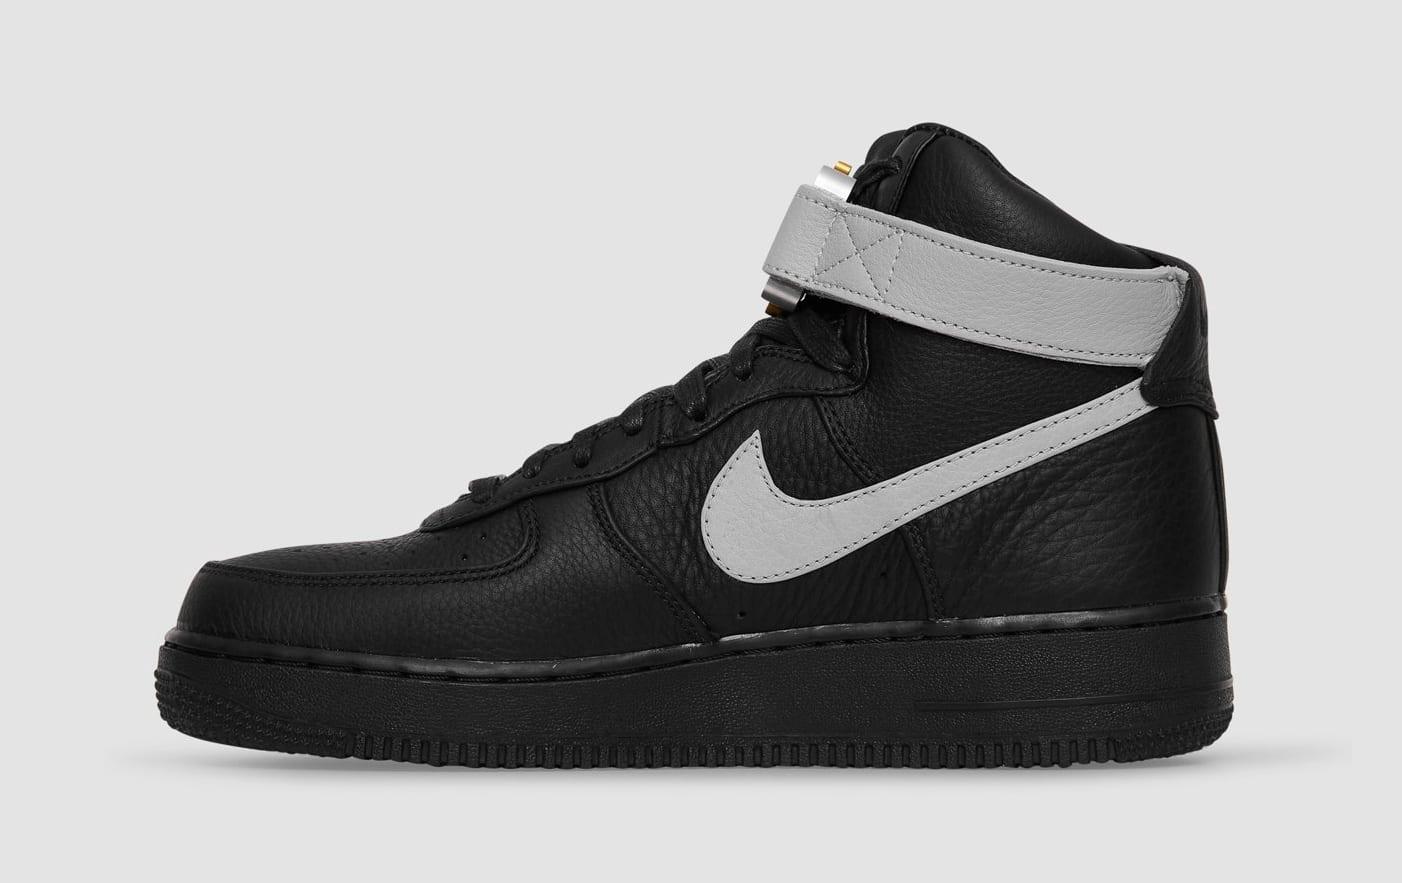 Alyx x Nike Air Force 1 High CQ4018-003 Medial